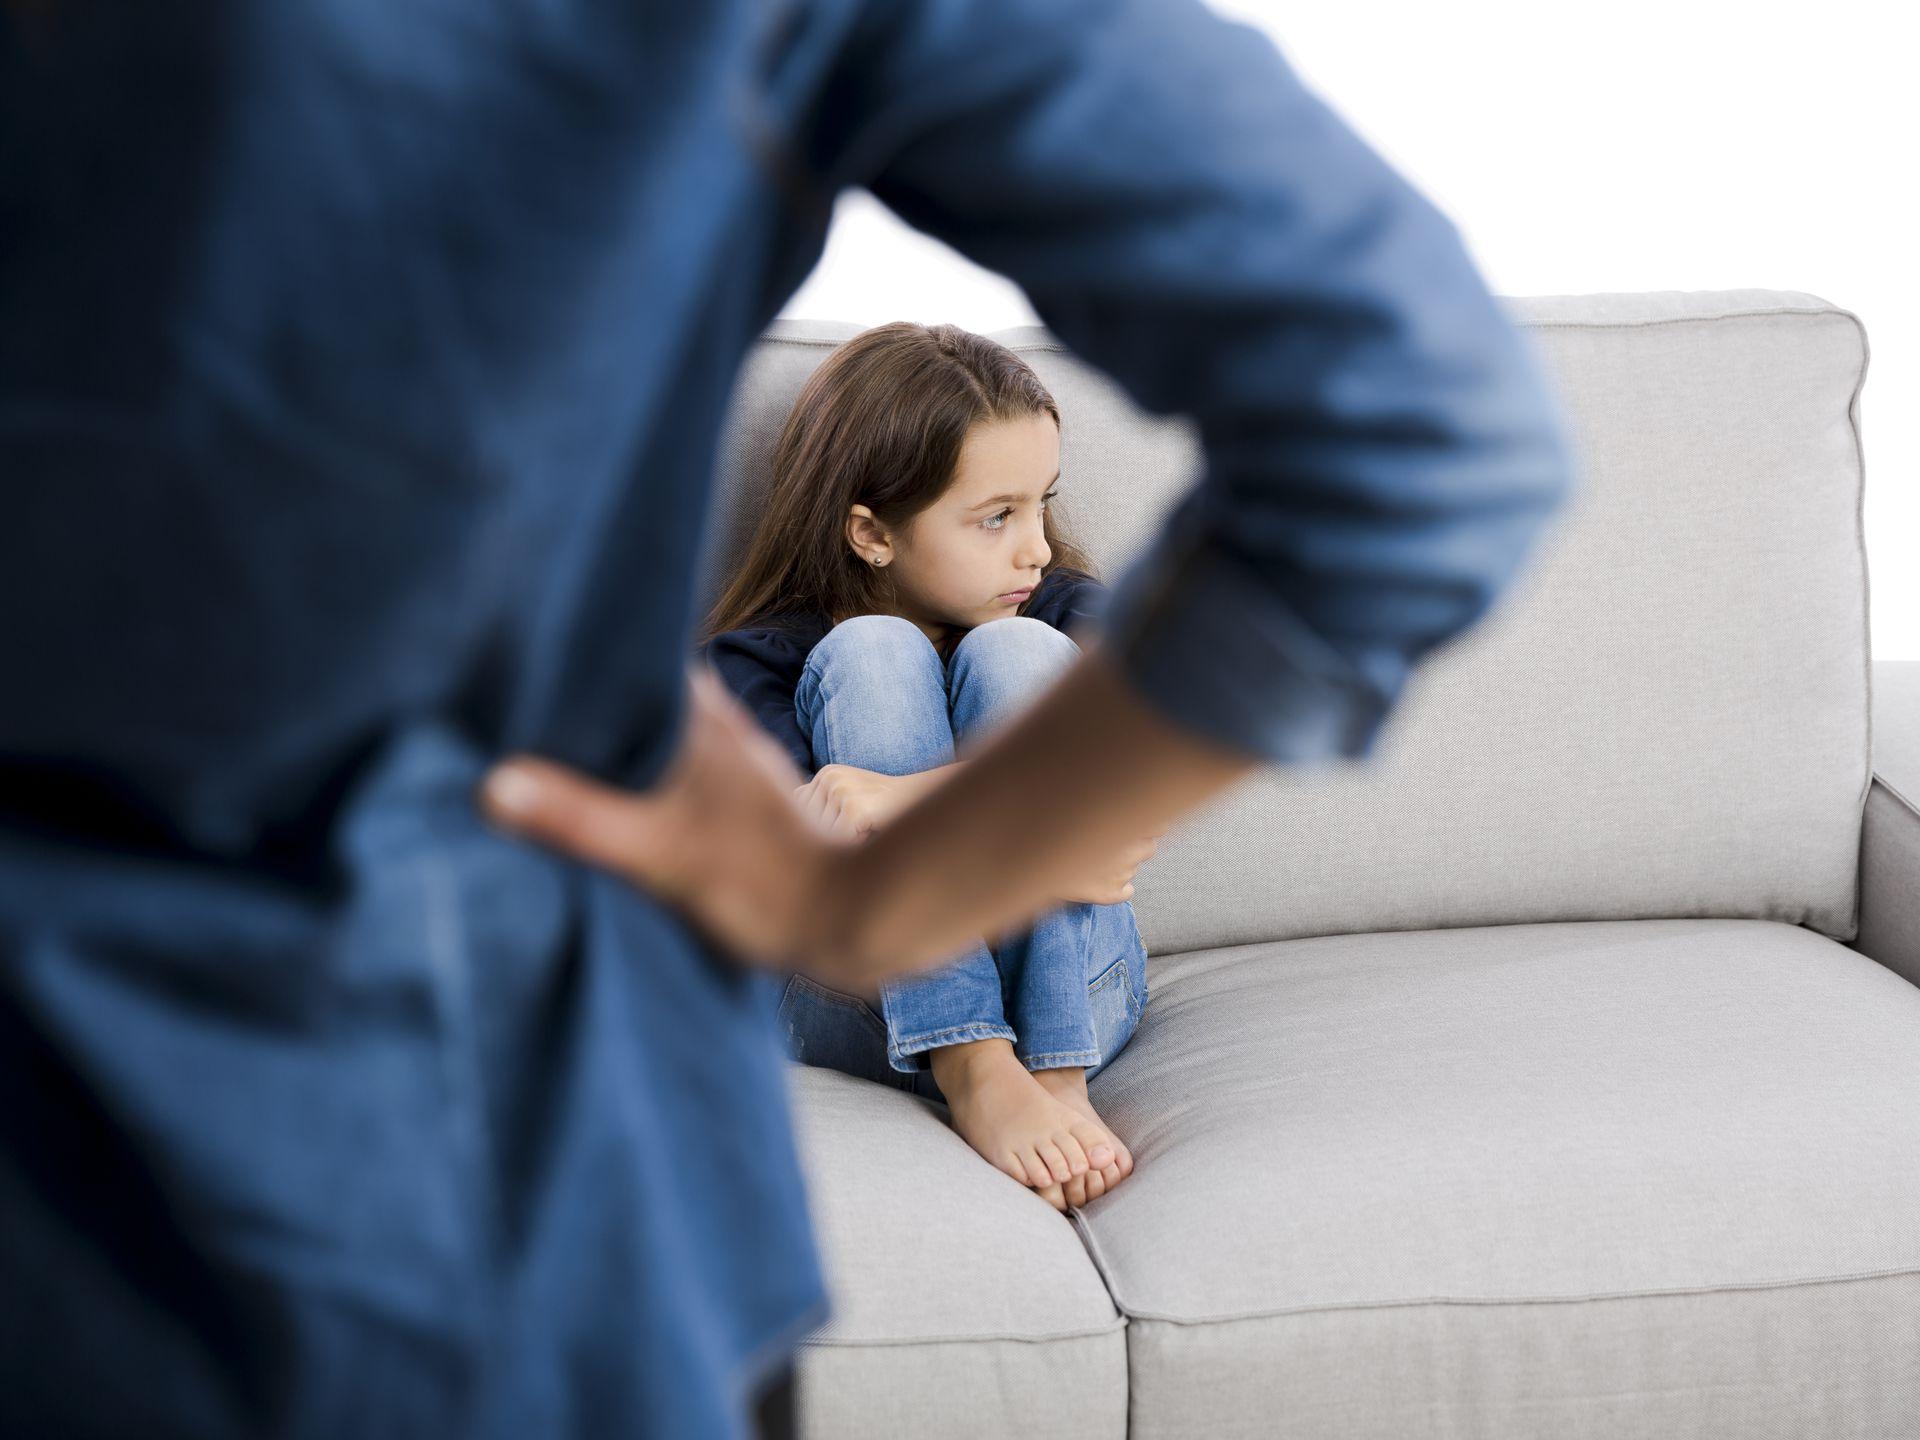 Maltreatened Child Syndrome